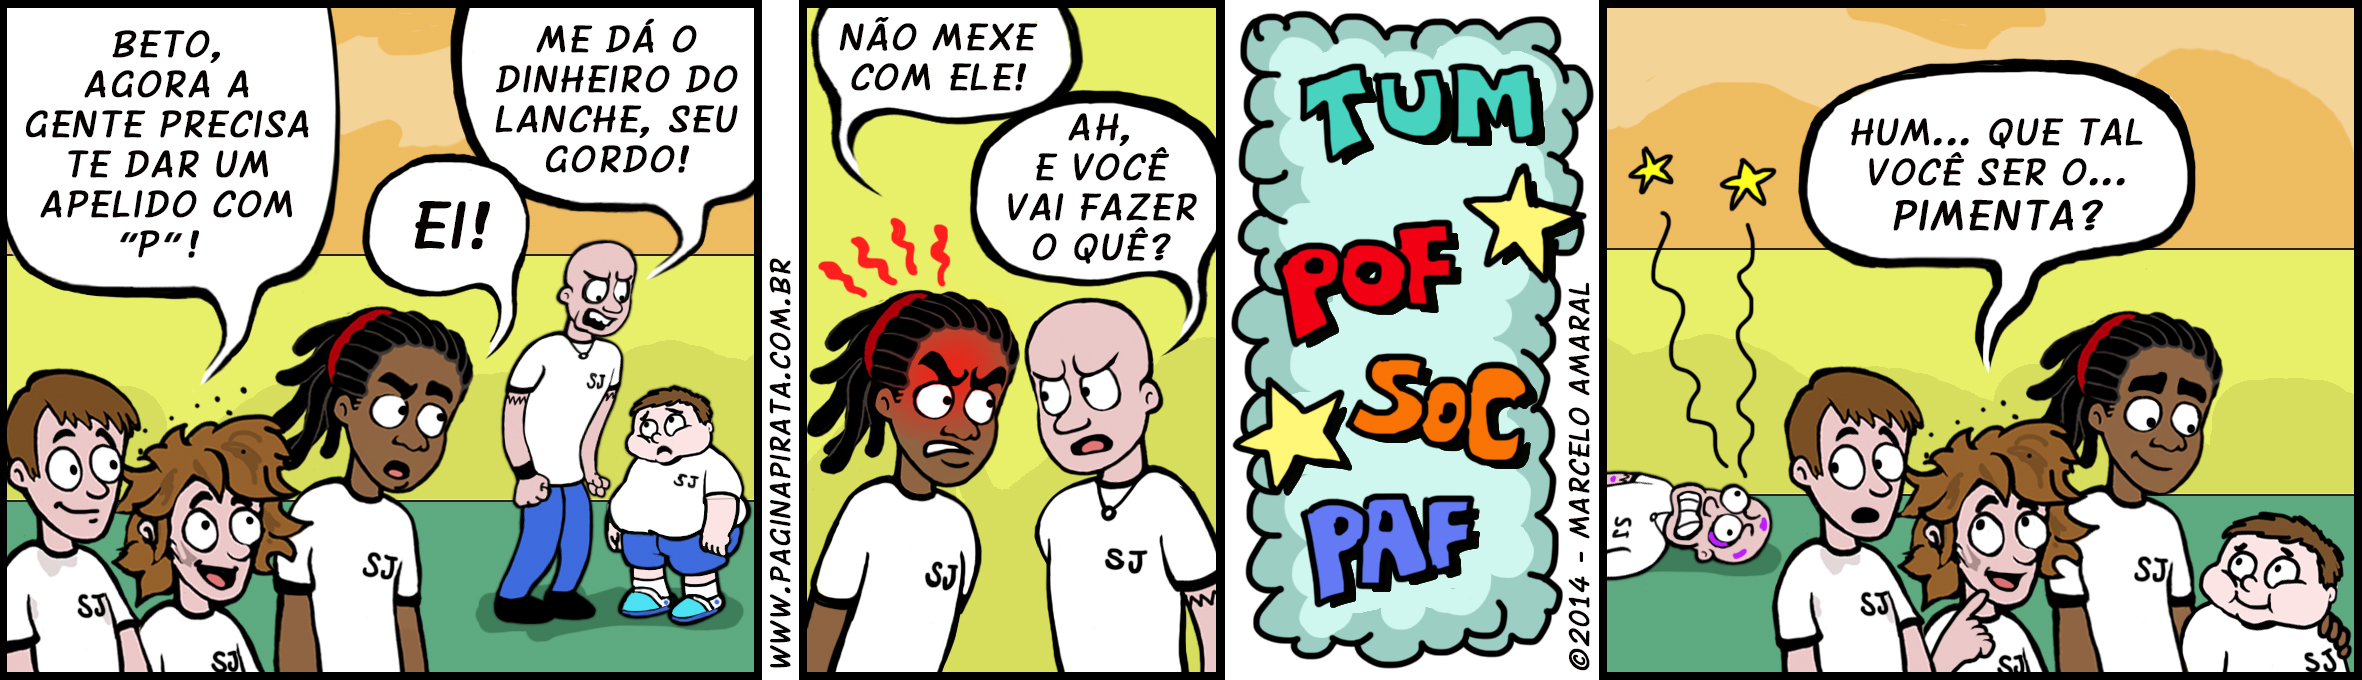 "#26 - Pimenta, a ""máquina antibullying"" original rsrs"